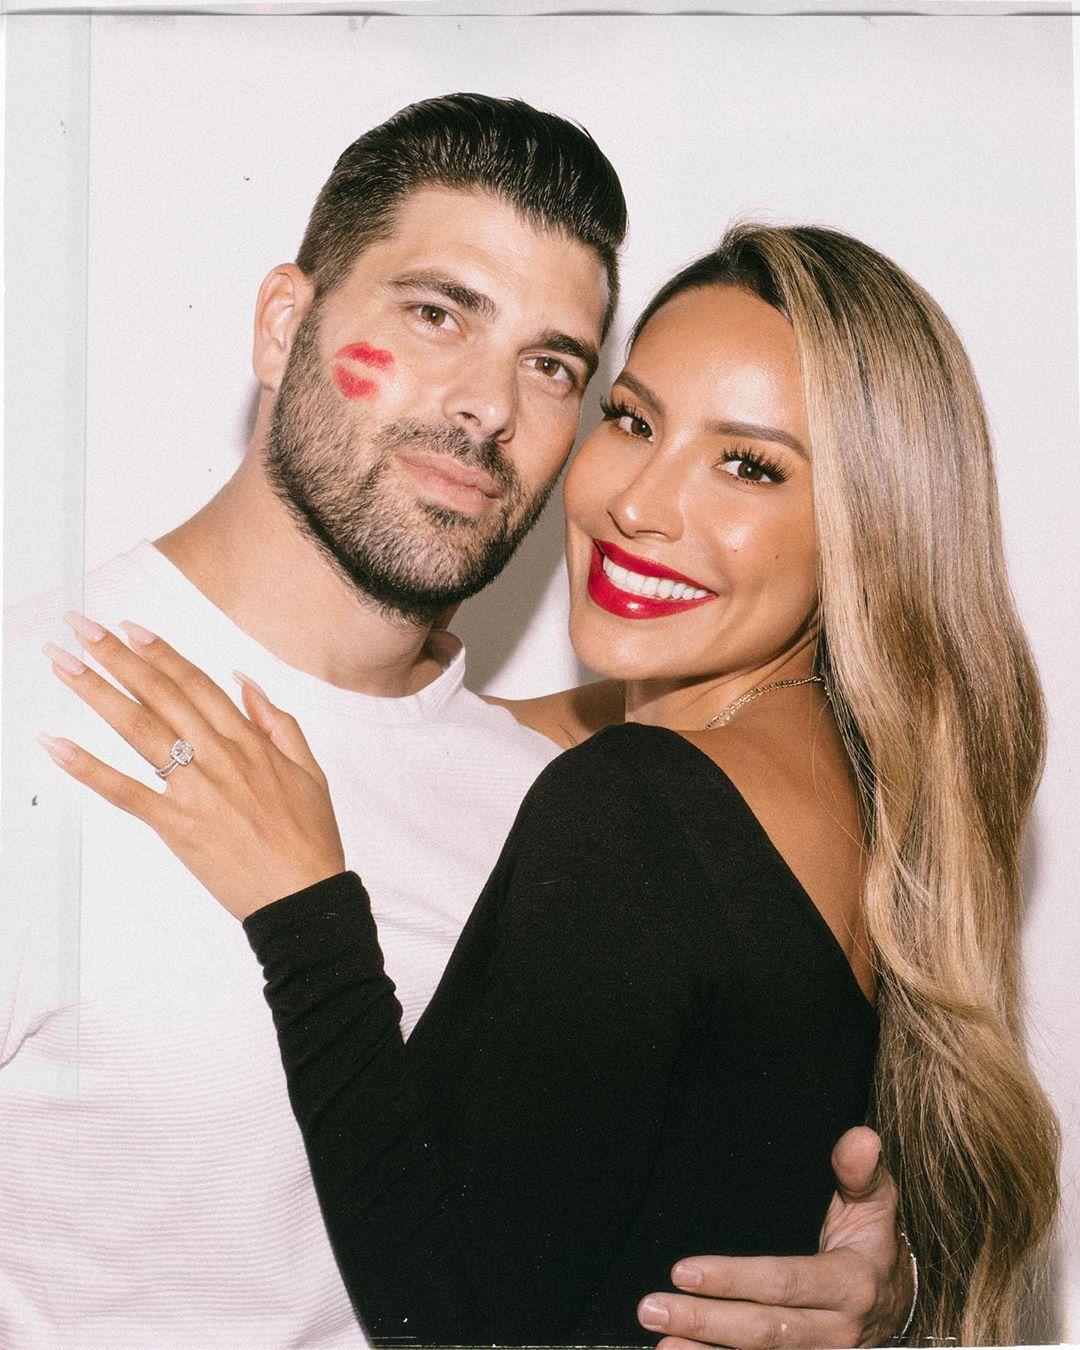 Desi Perkins and her husband Steve Perkins